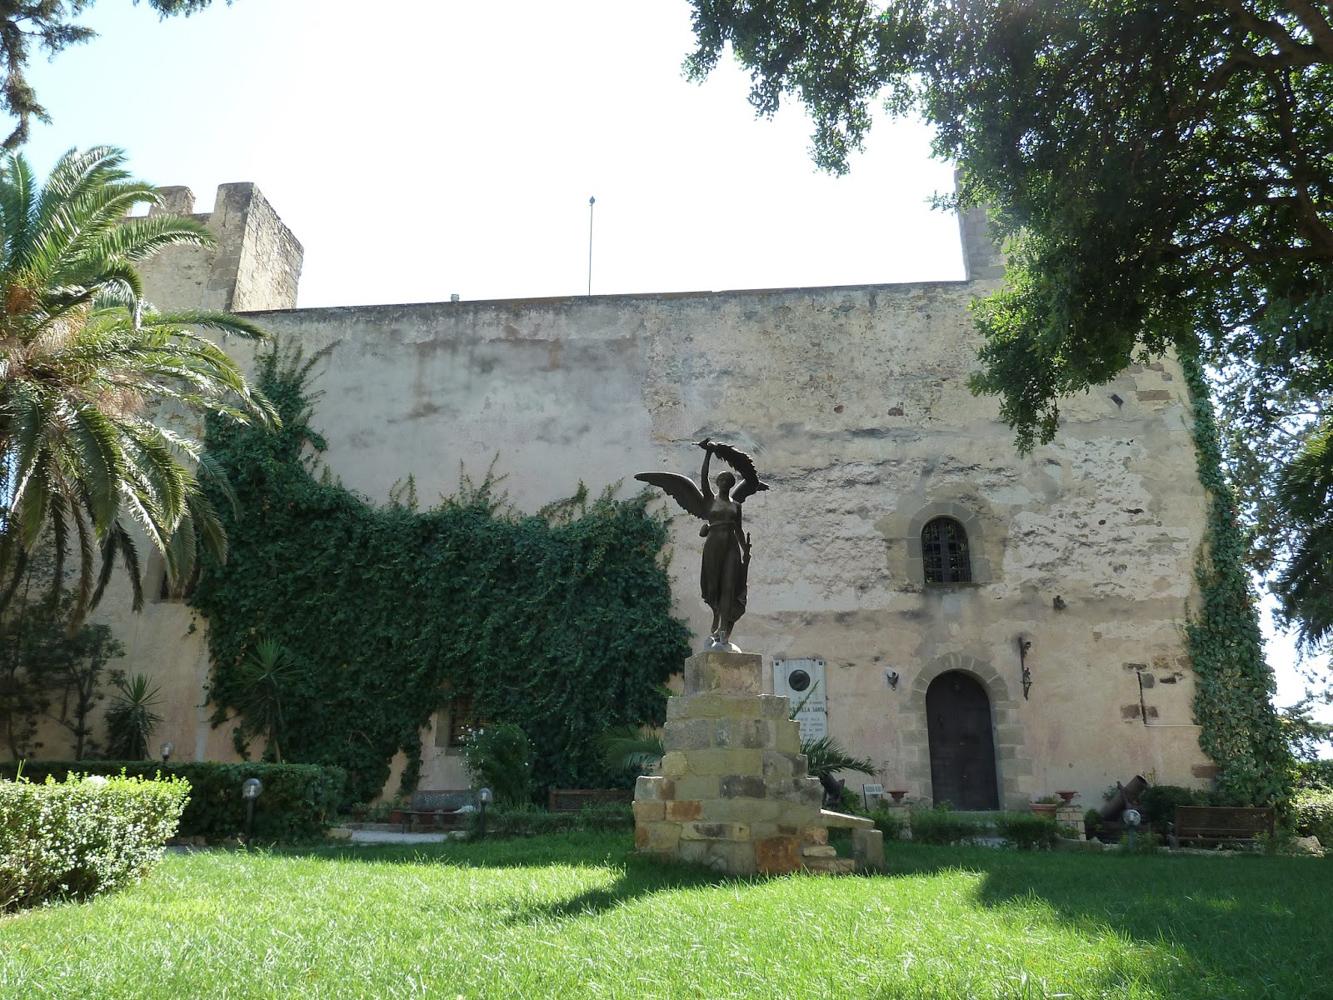 Sanluri's medieval castle